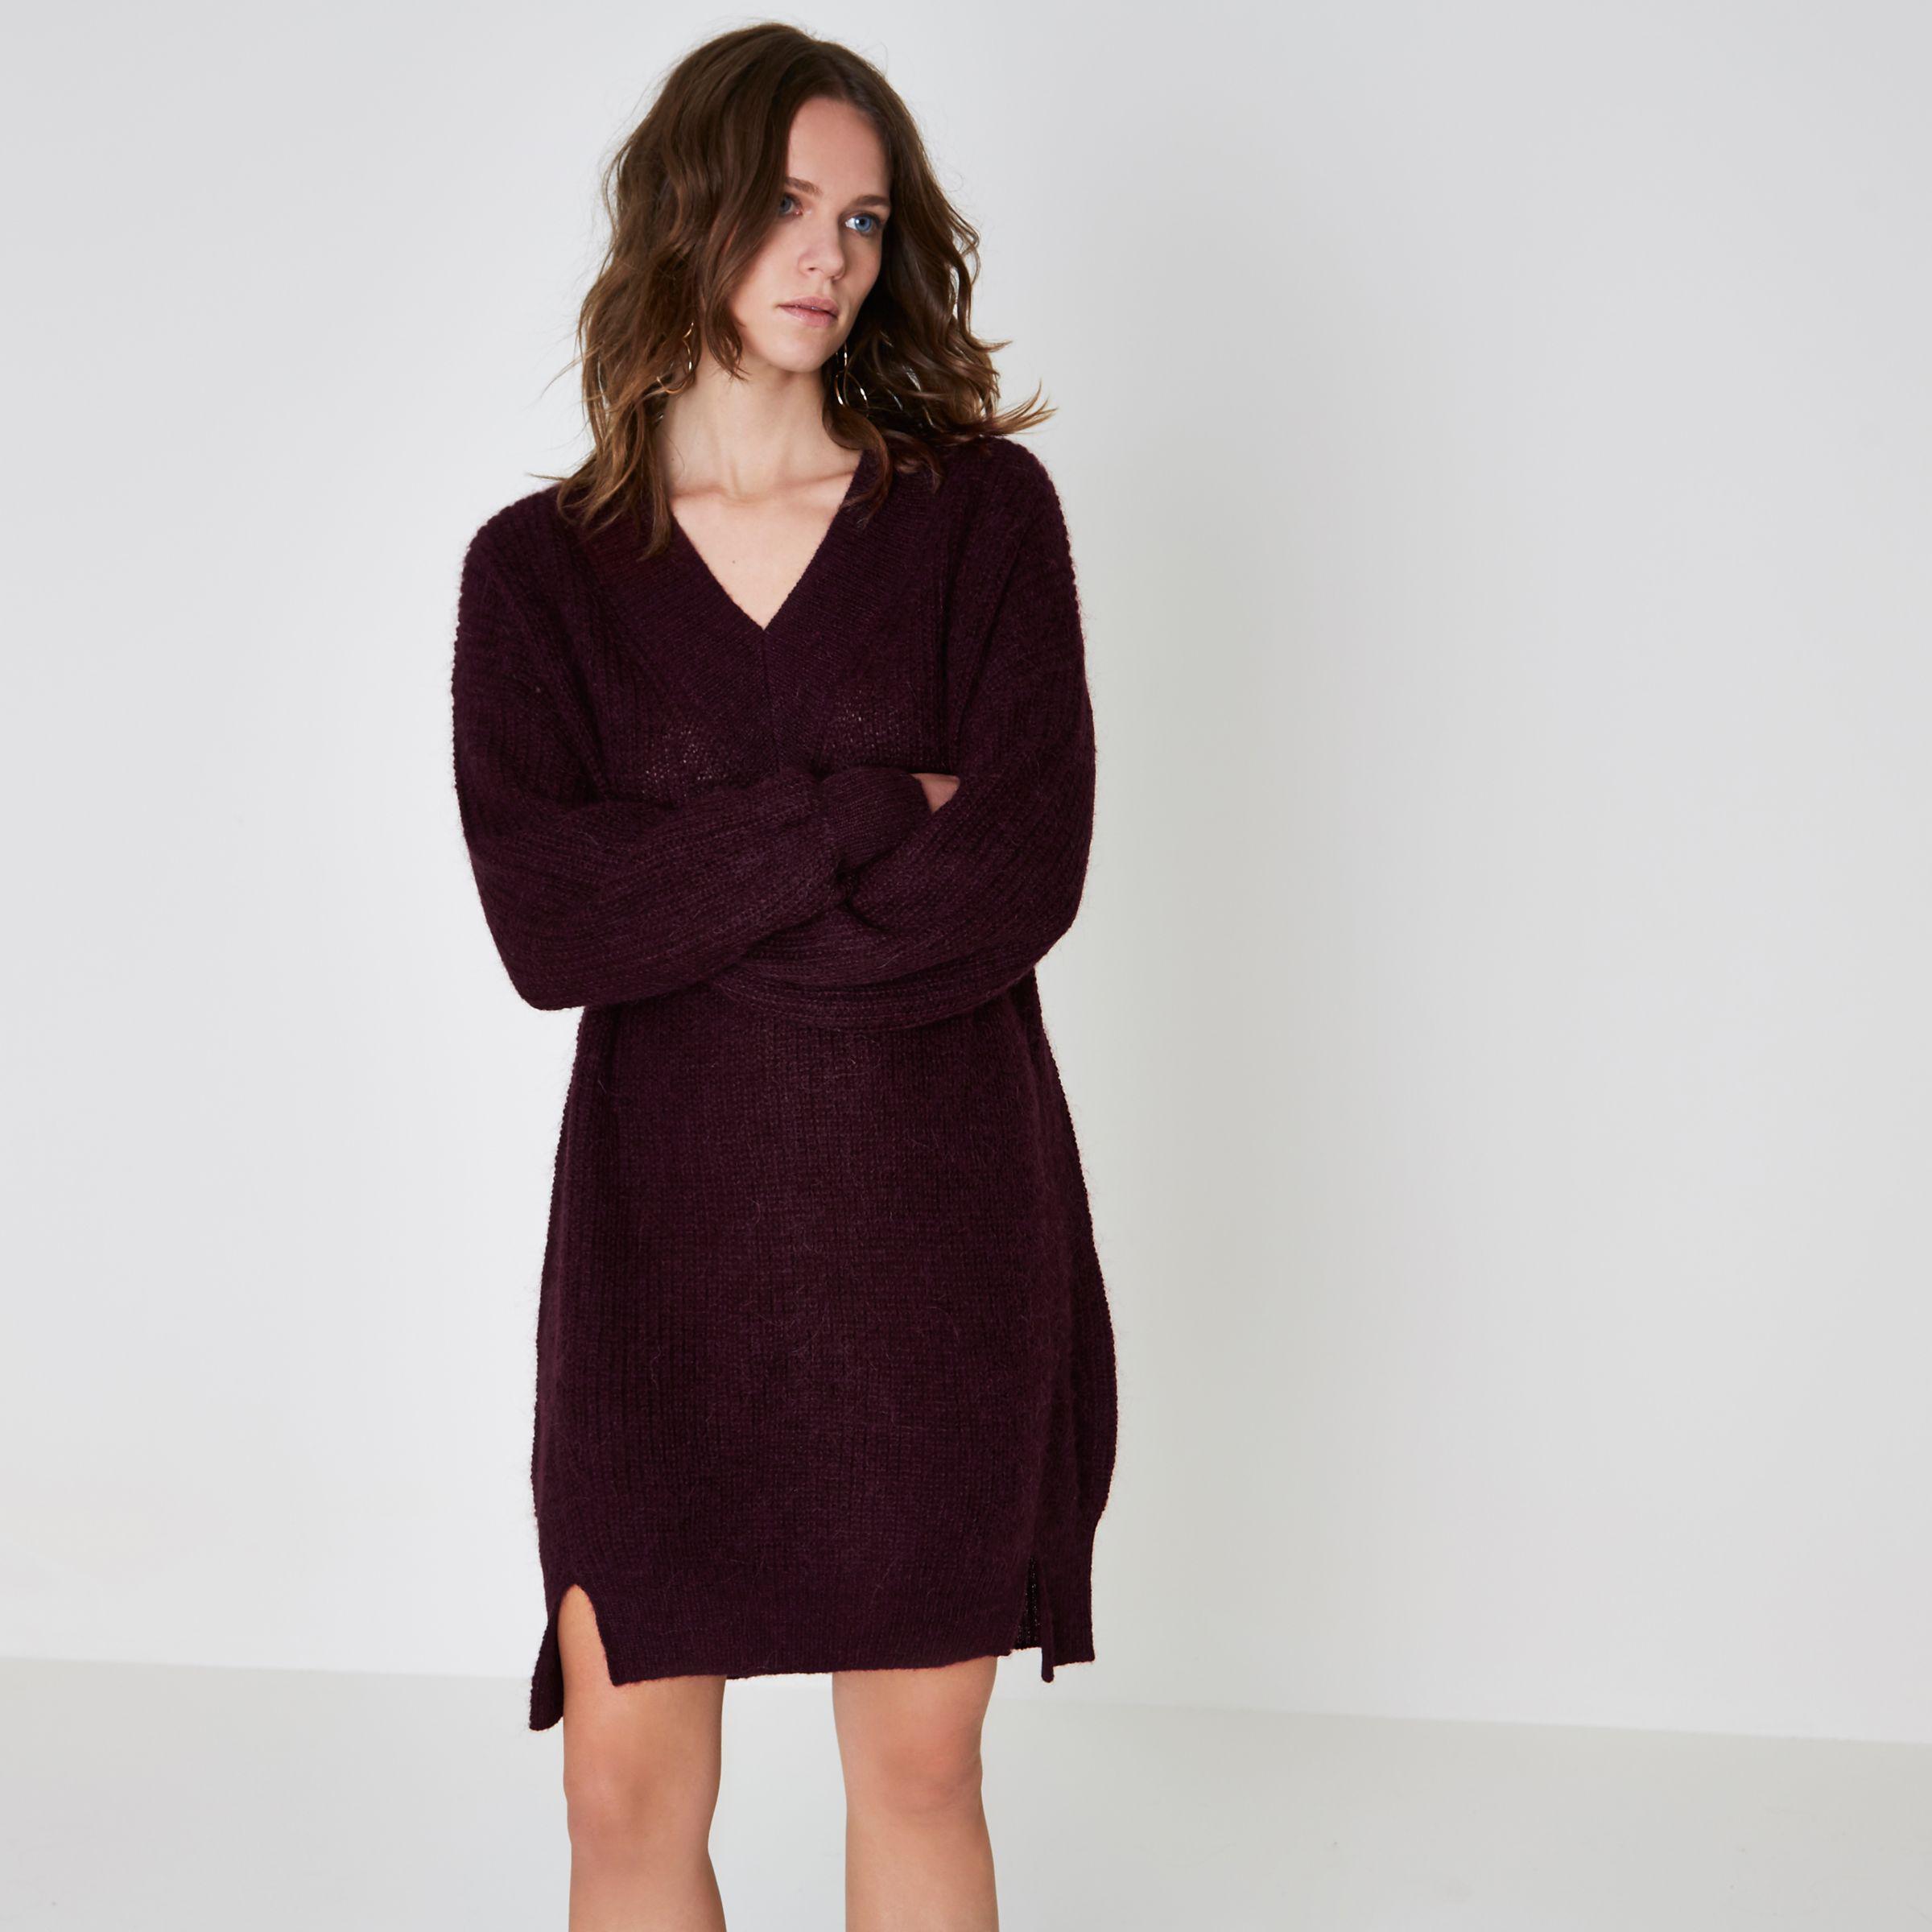 b5d0db6bacf0 Lyst - River Island Burgundy V Neck Knit Jumper Dress in Purple